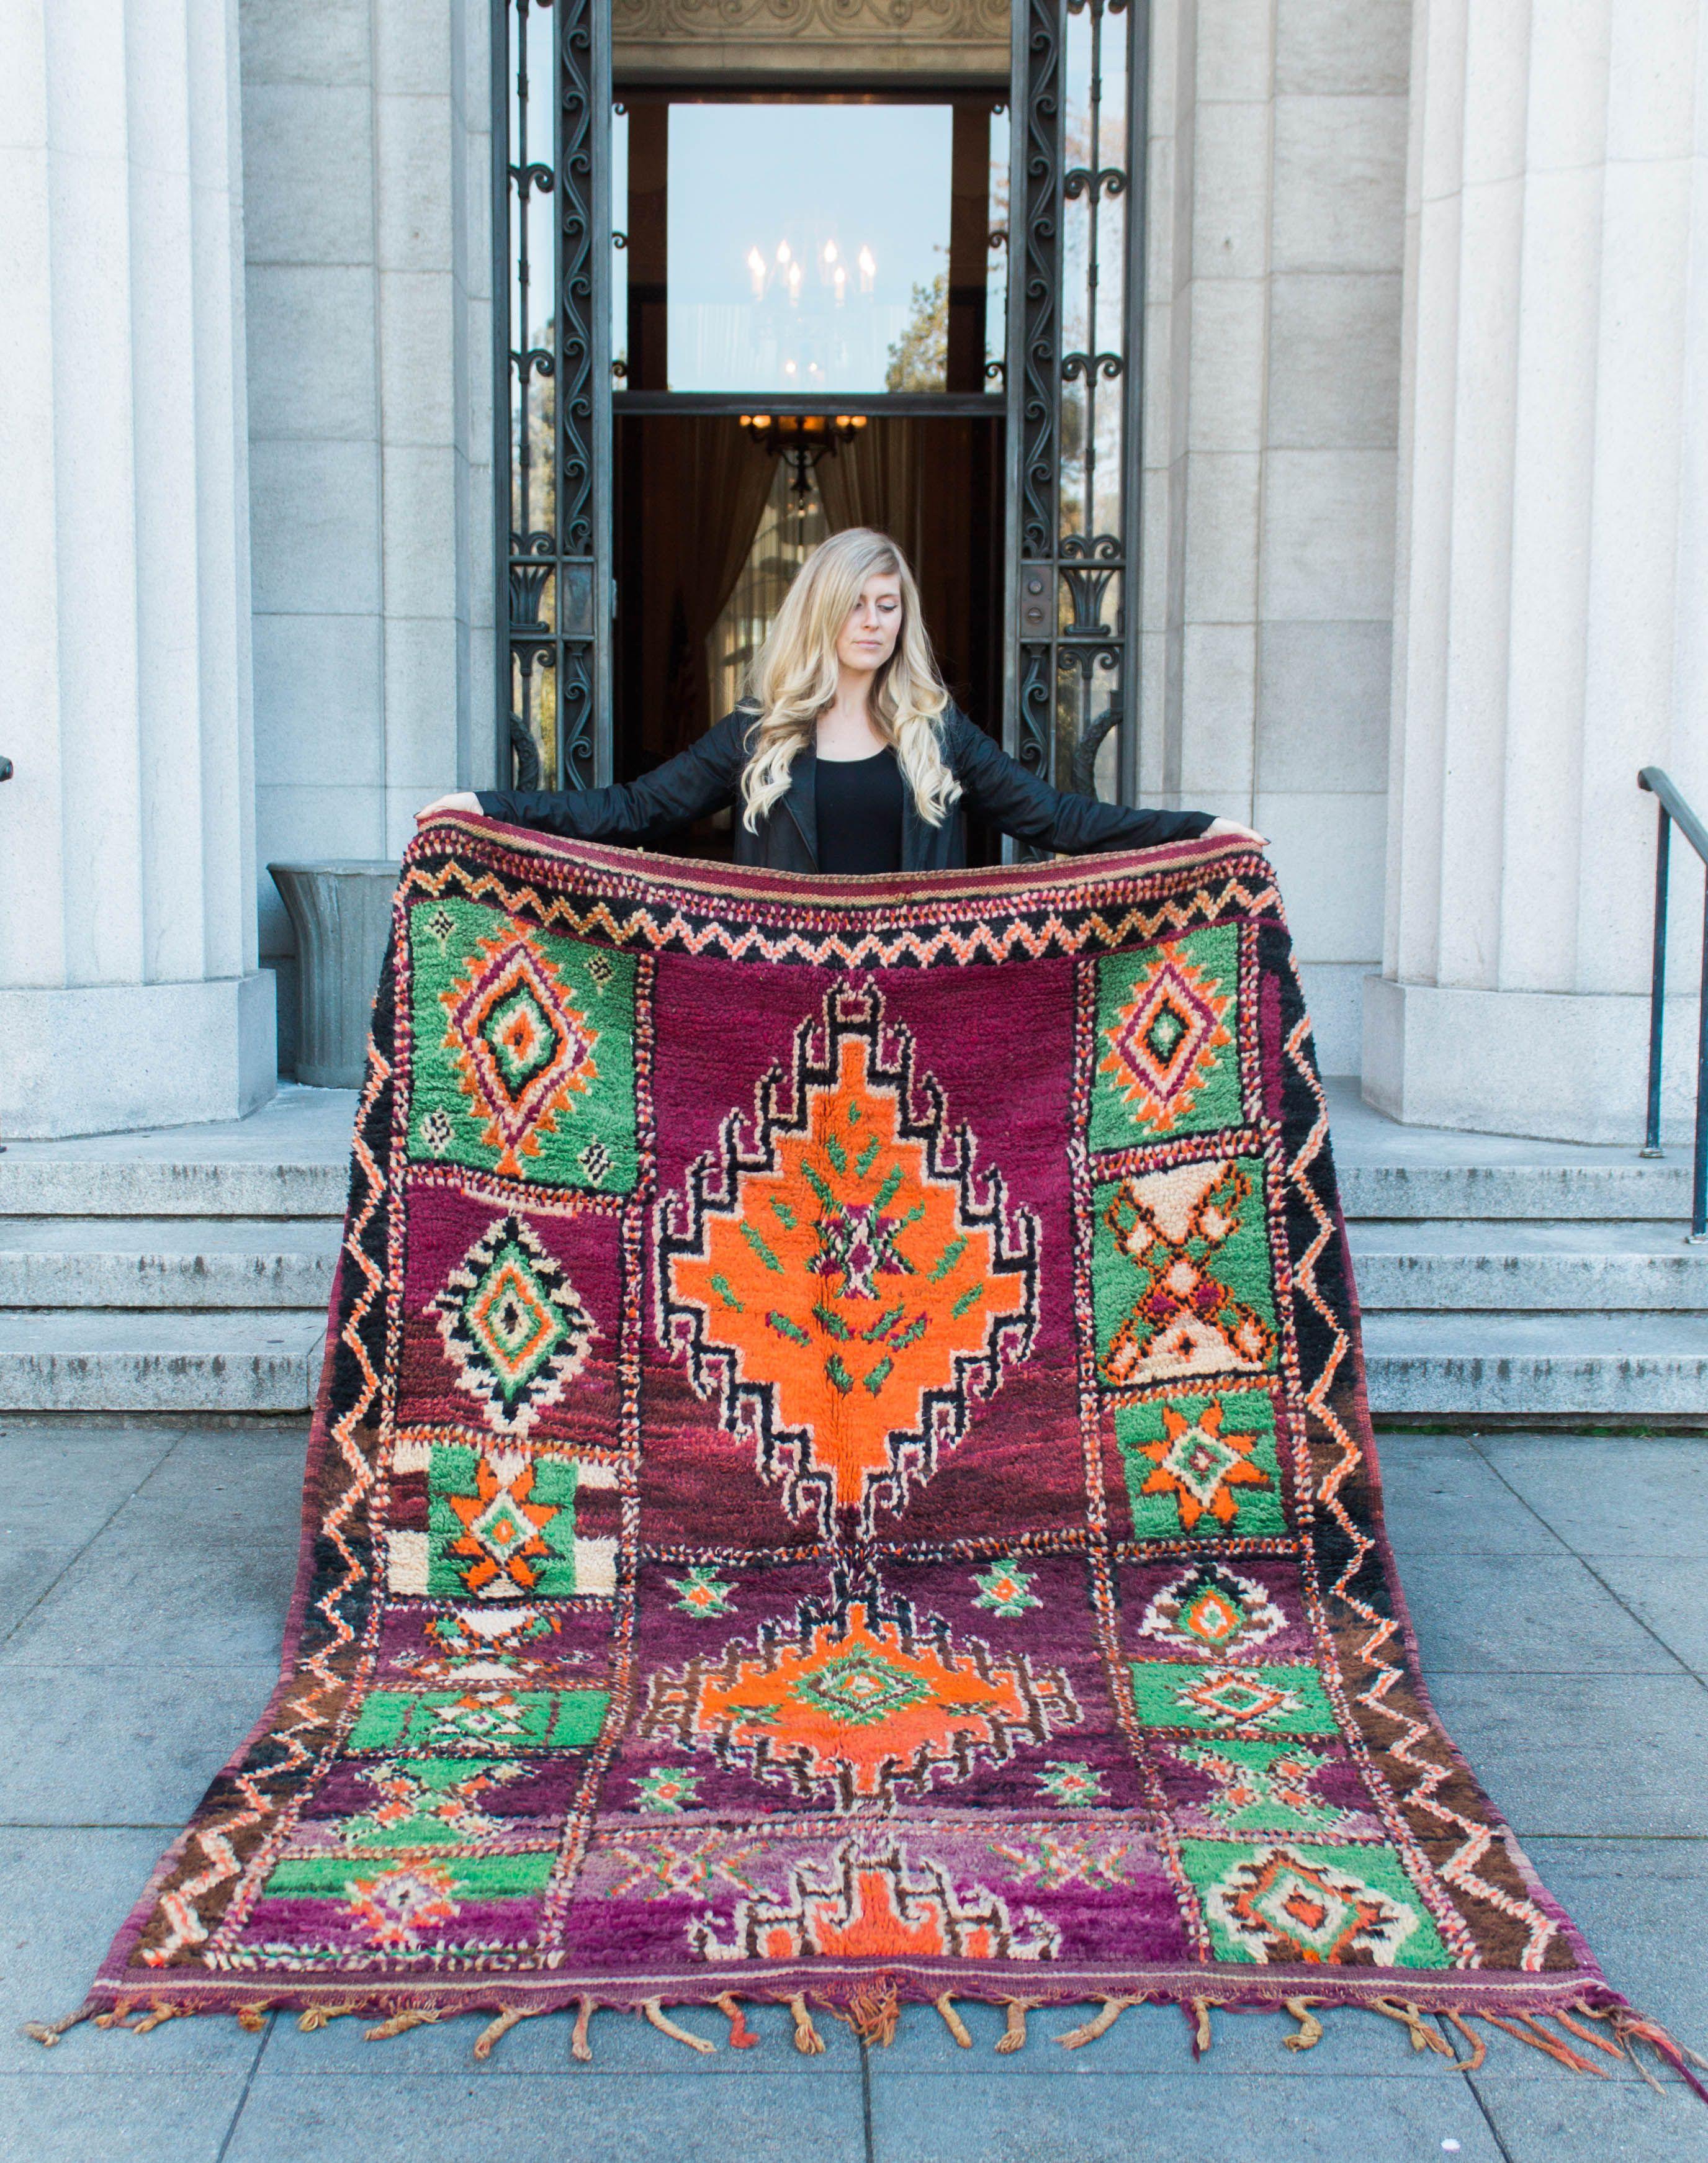 Moroccan Rug Boujad Unique Wool Bright Colors Orange Green Purple Berber The Elegant Nomad